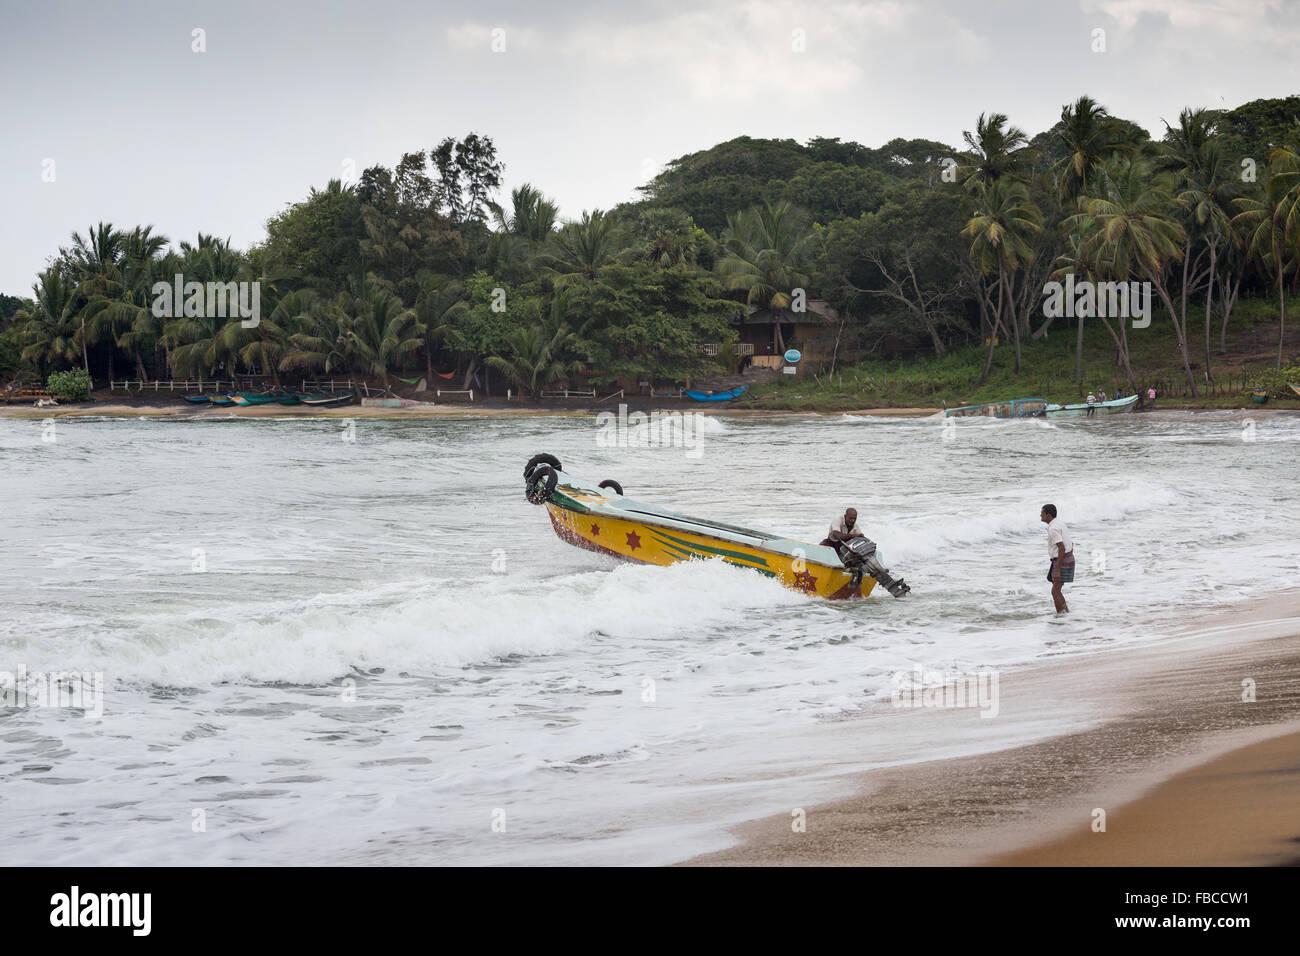 Fishermen on a beach, Arugam Bay, Sri Lanka, Asia Stock Photo